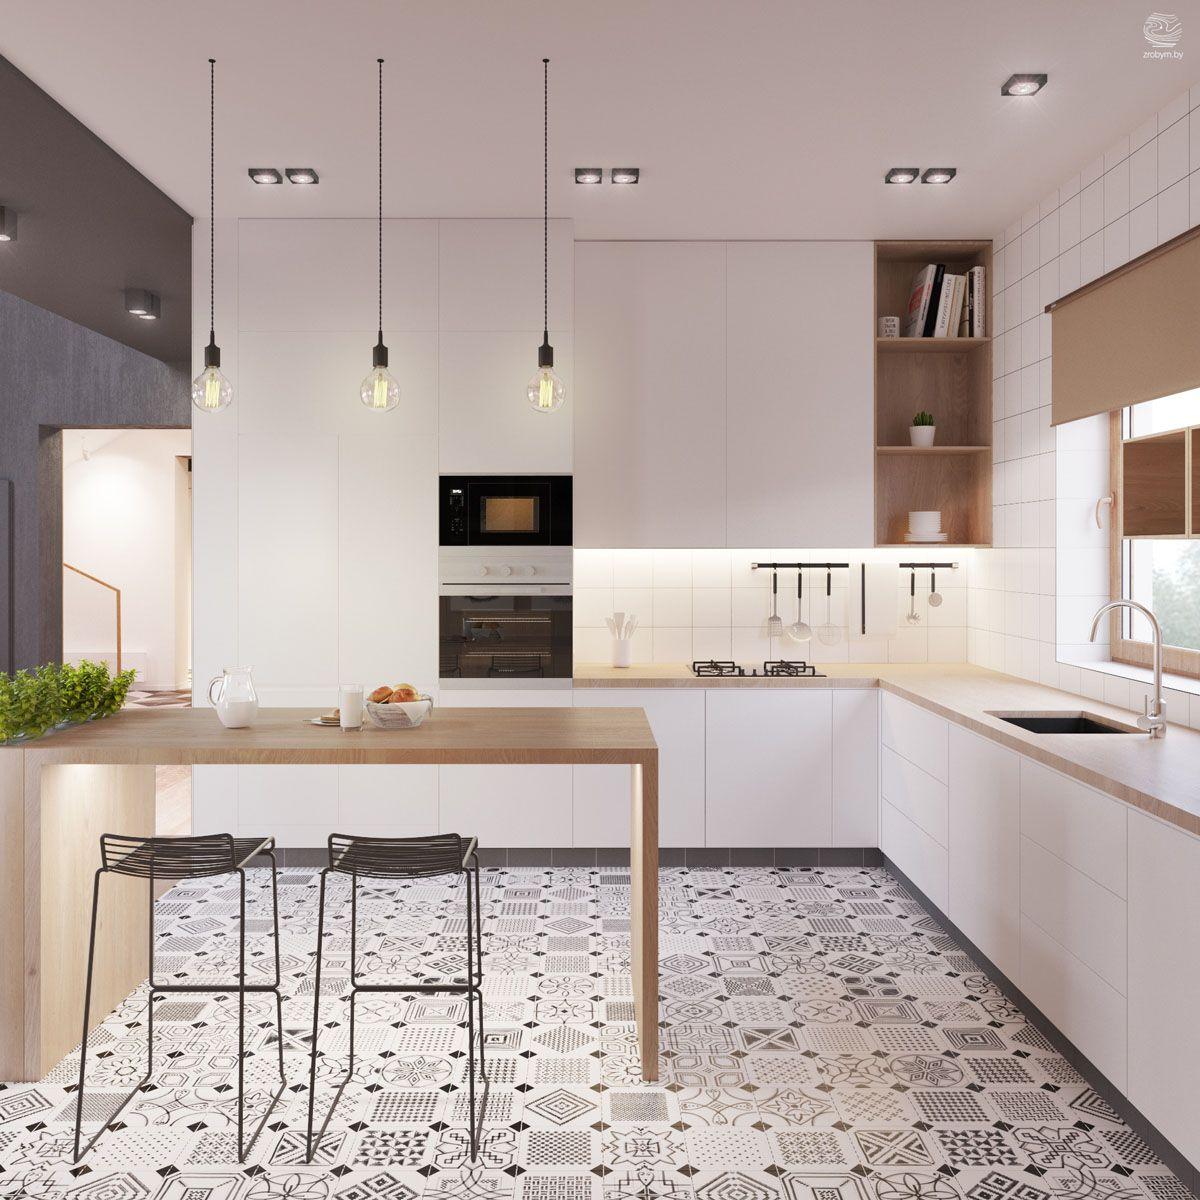 Sleek bright and minimalist this Scandinavian style